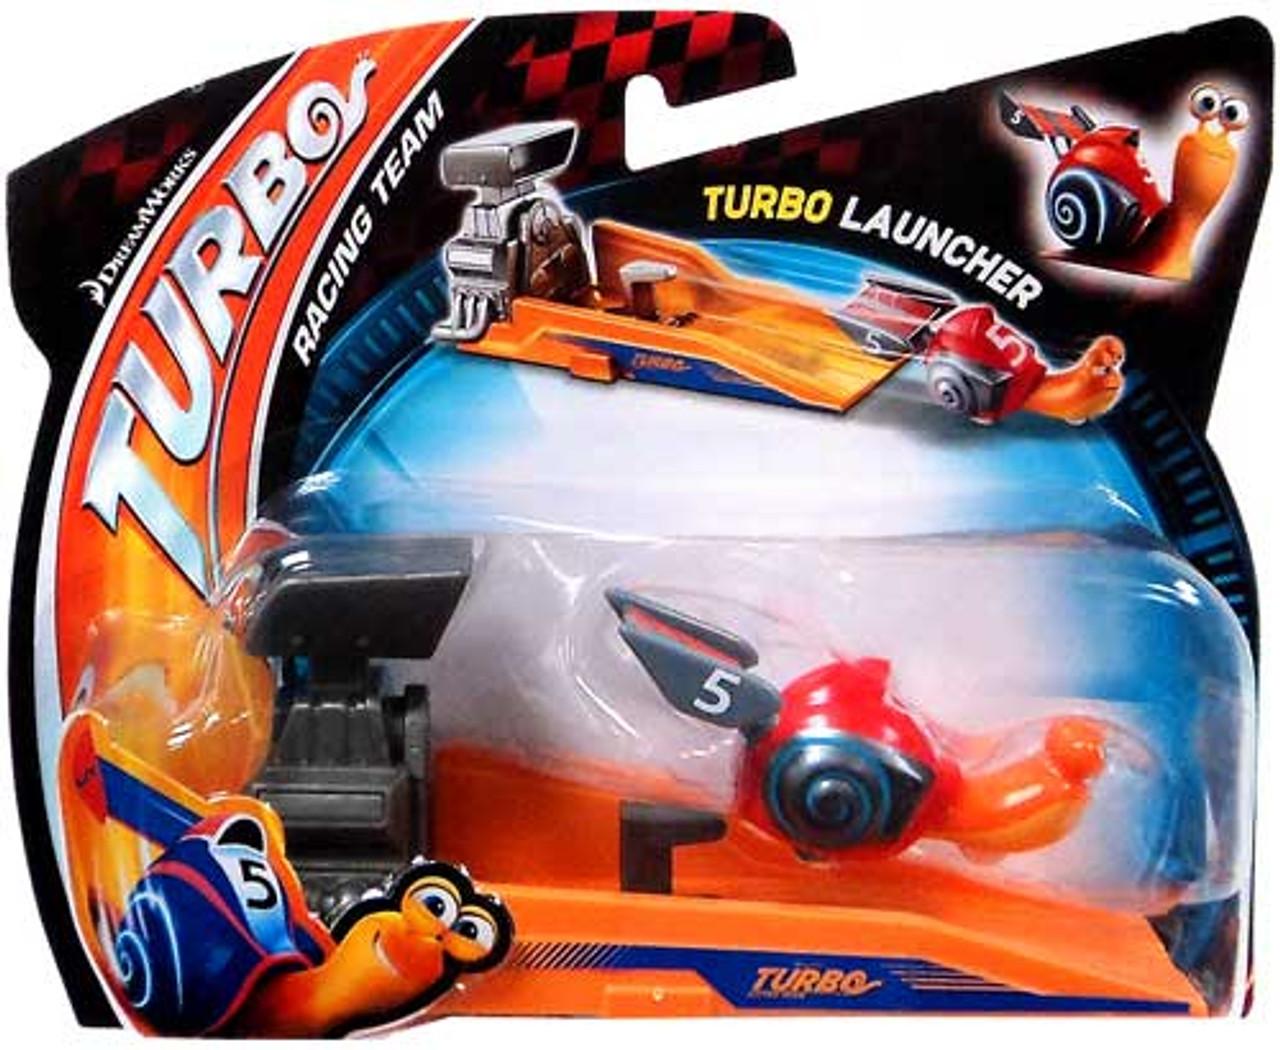 Turbo Launcher